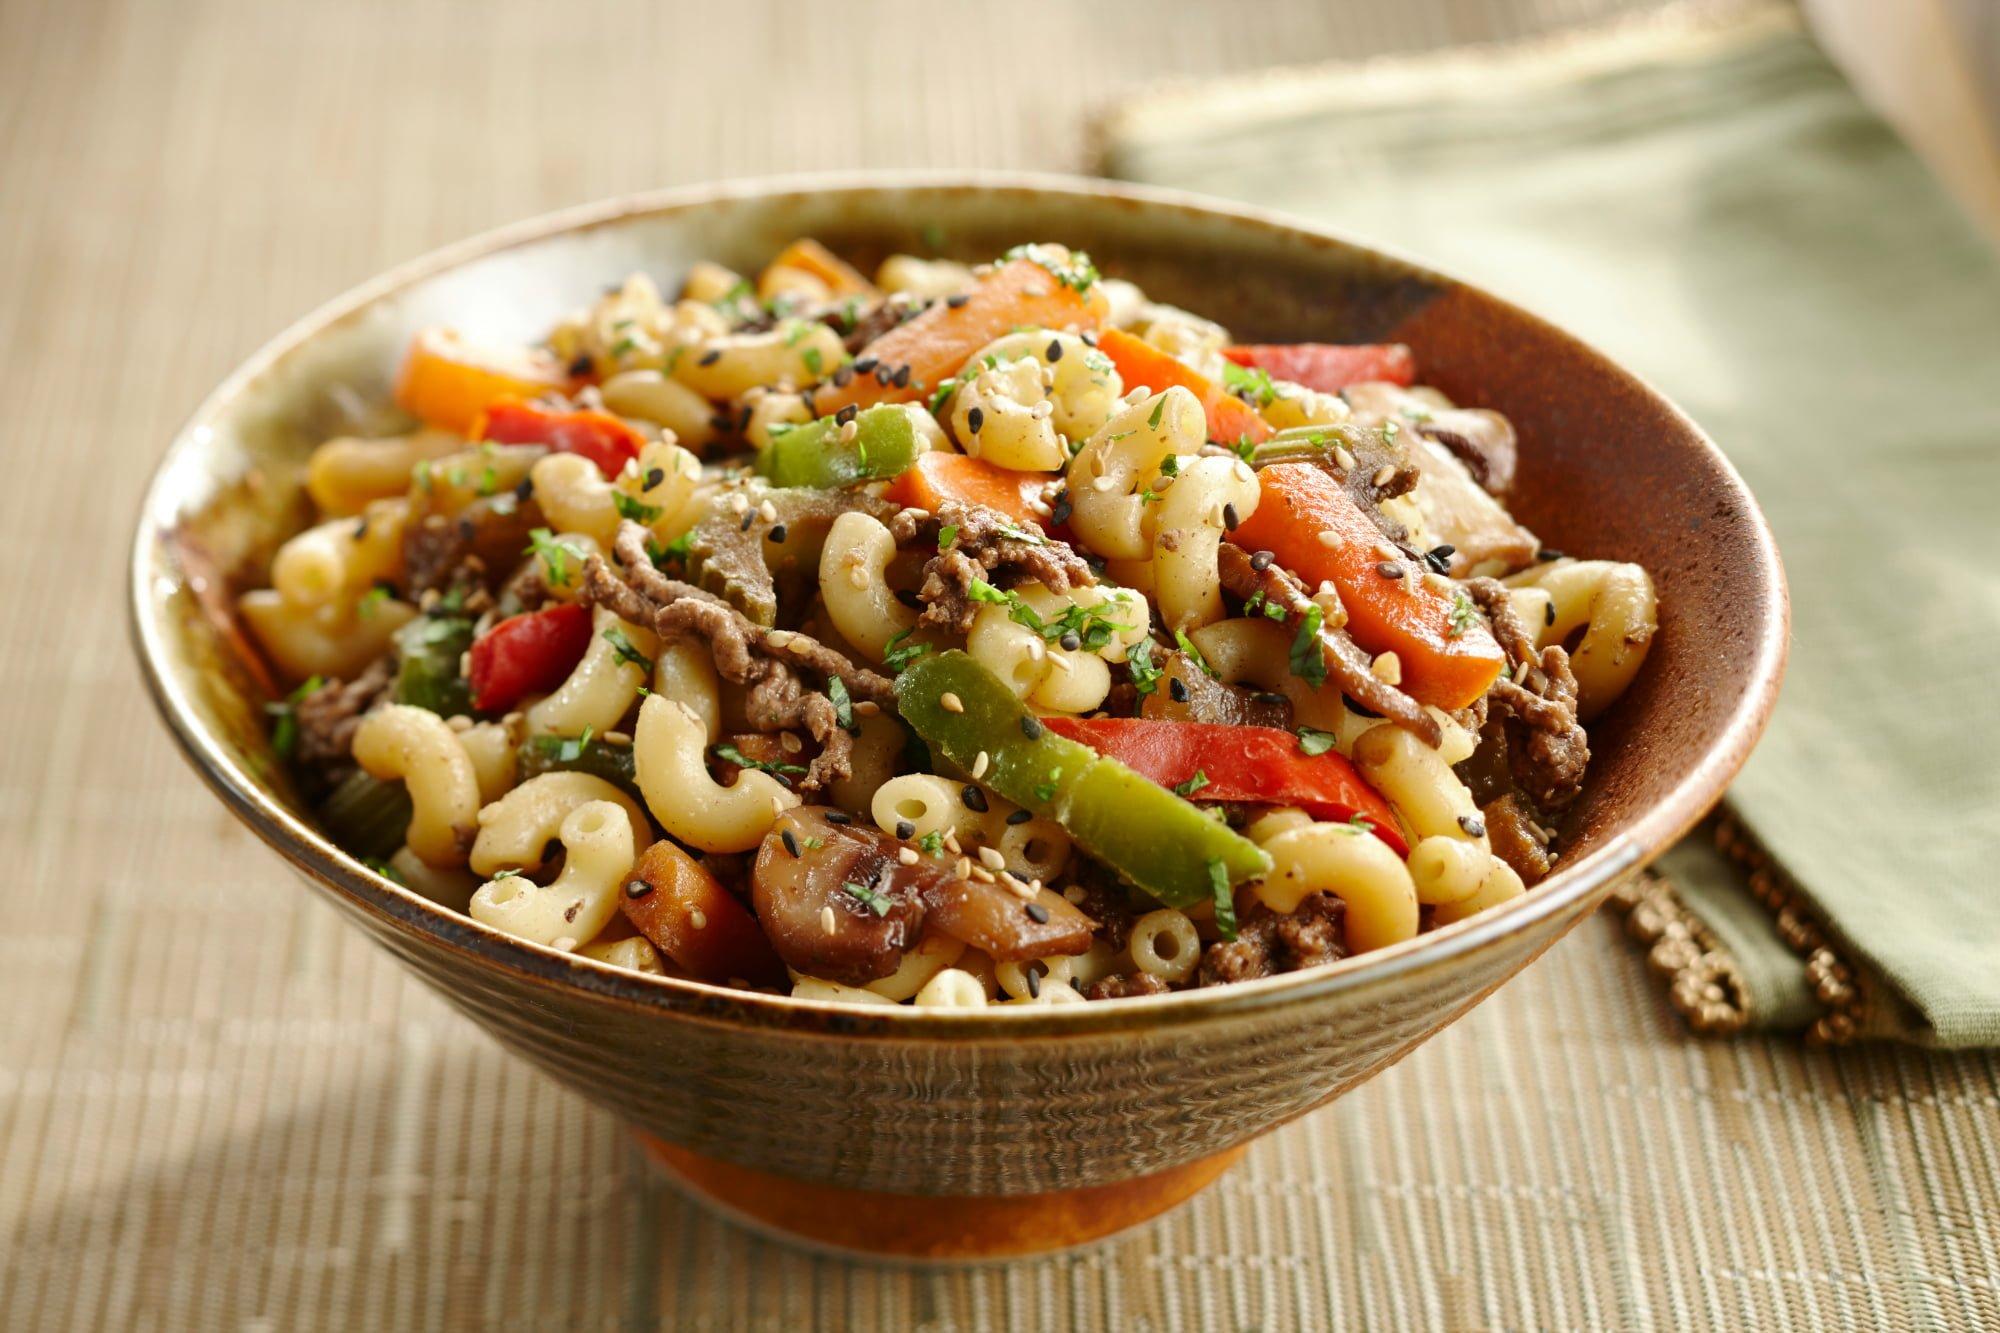 Macaroni chinois au boeuf et au sésame